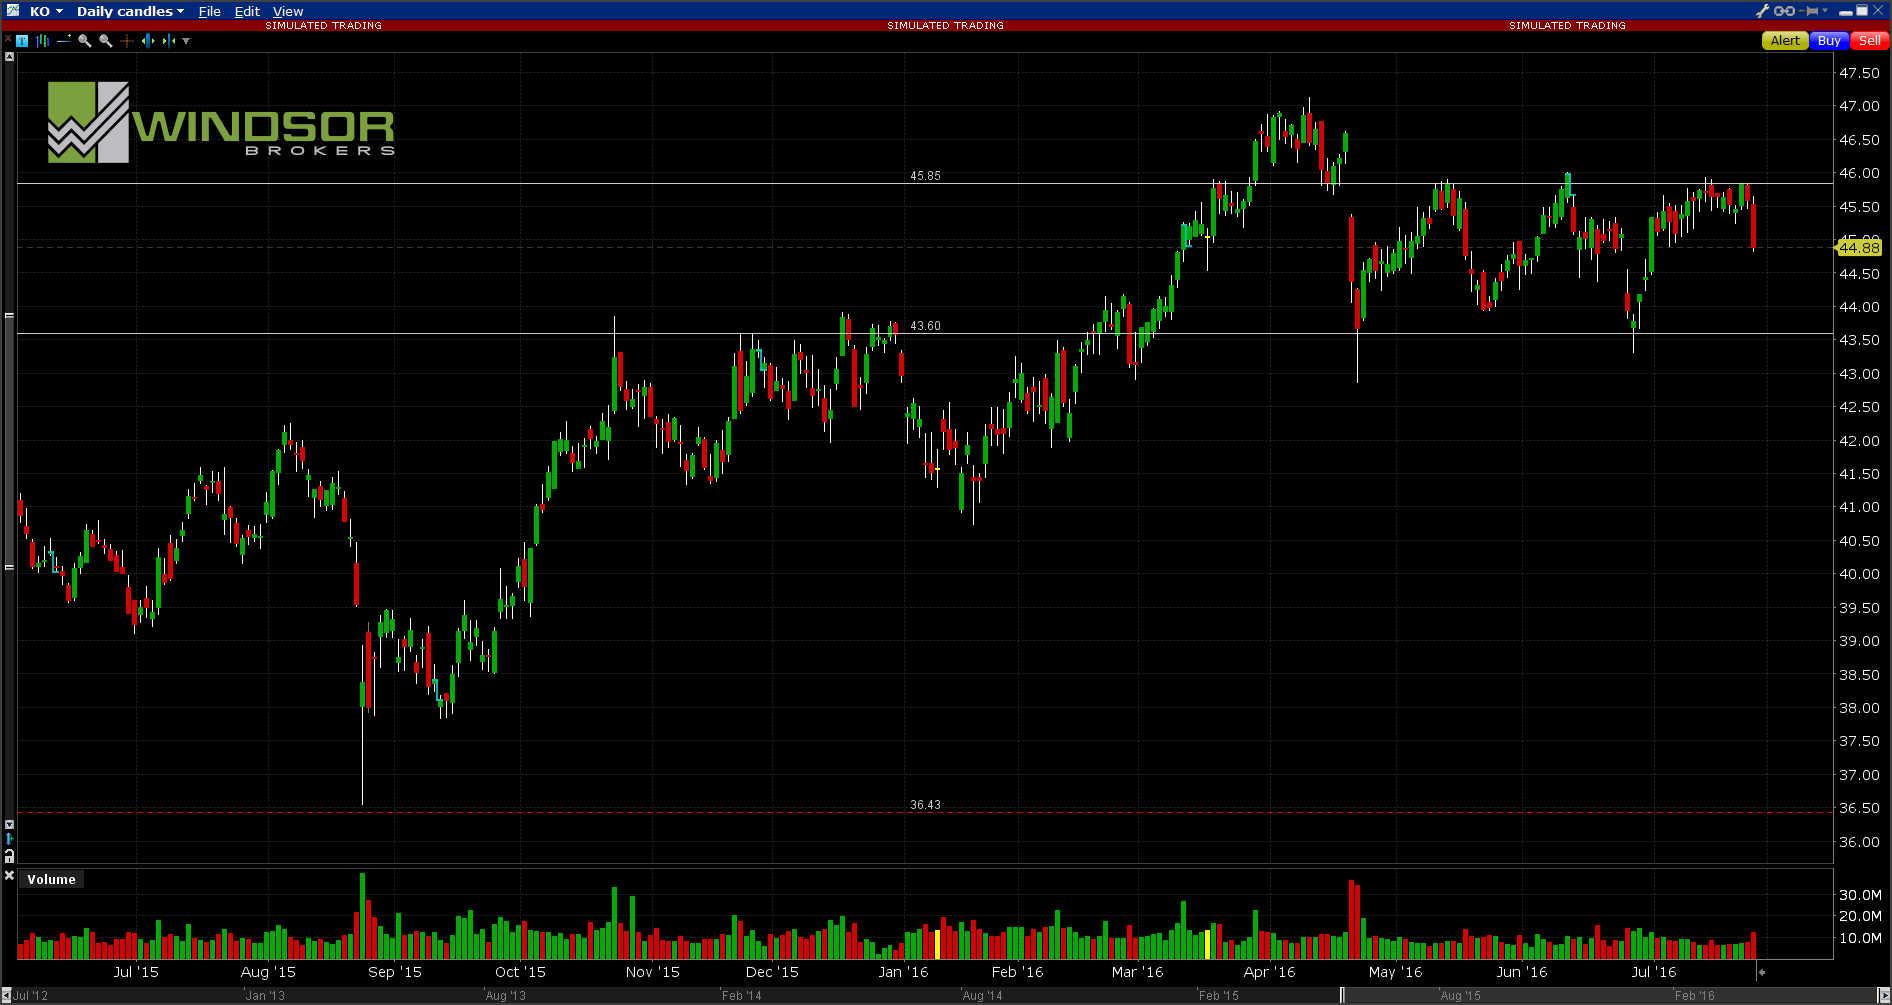 Ozforex share price chart